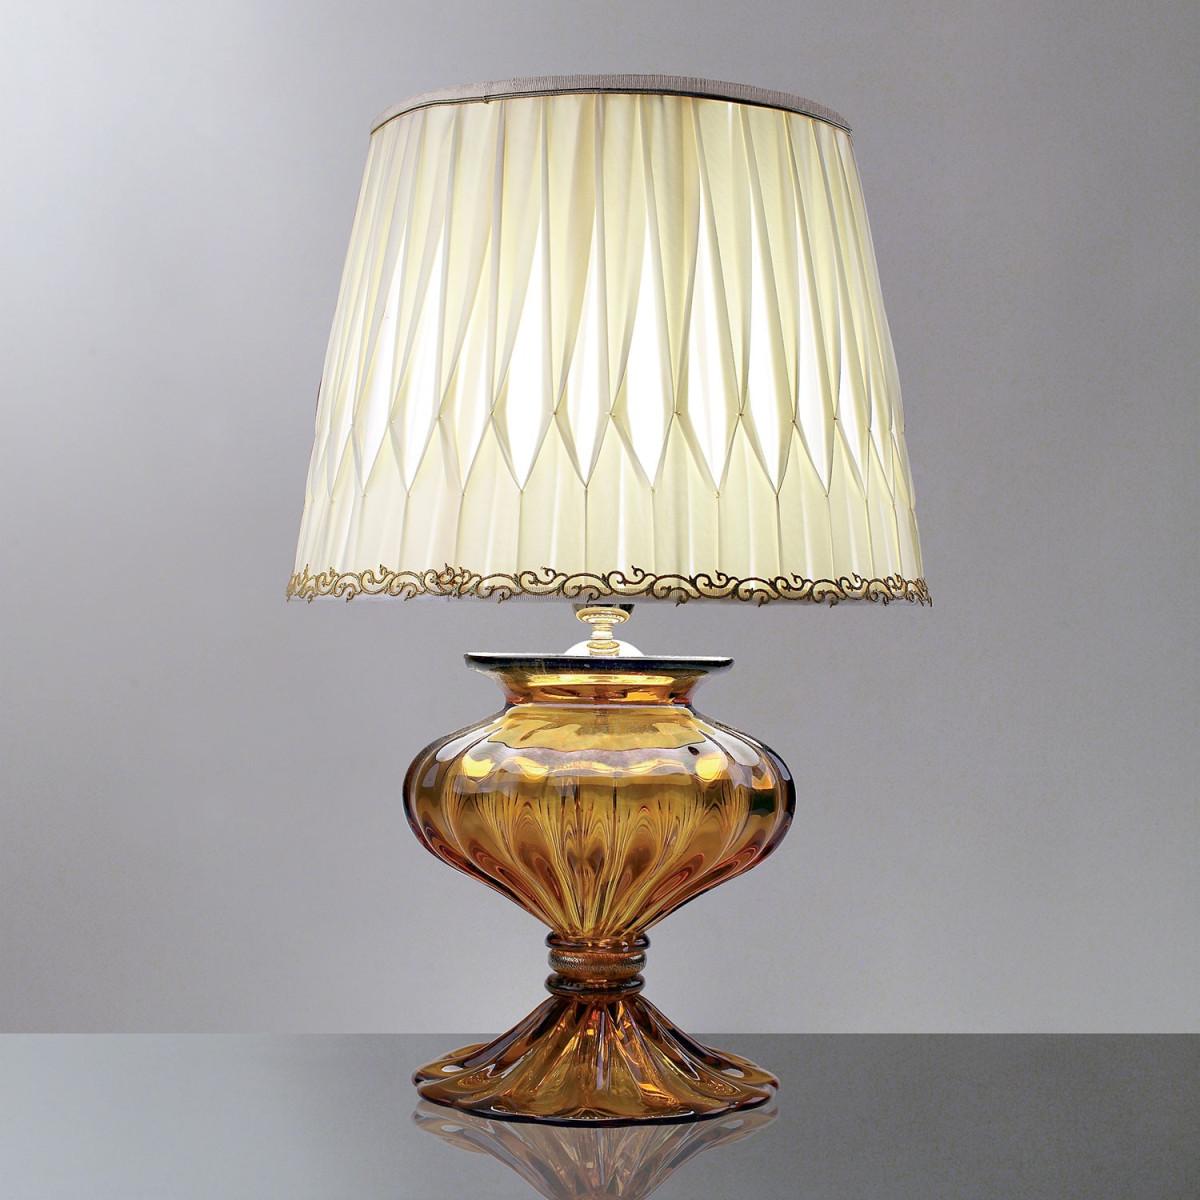 """Chloe"" lampe de table de Murano"